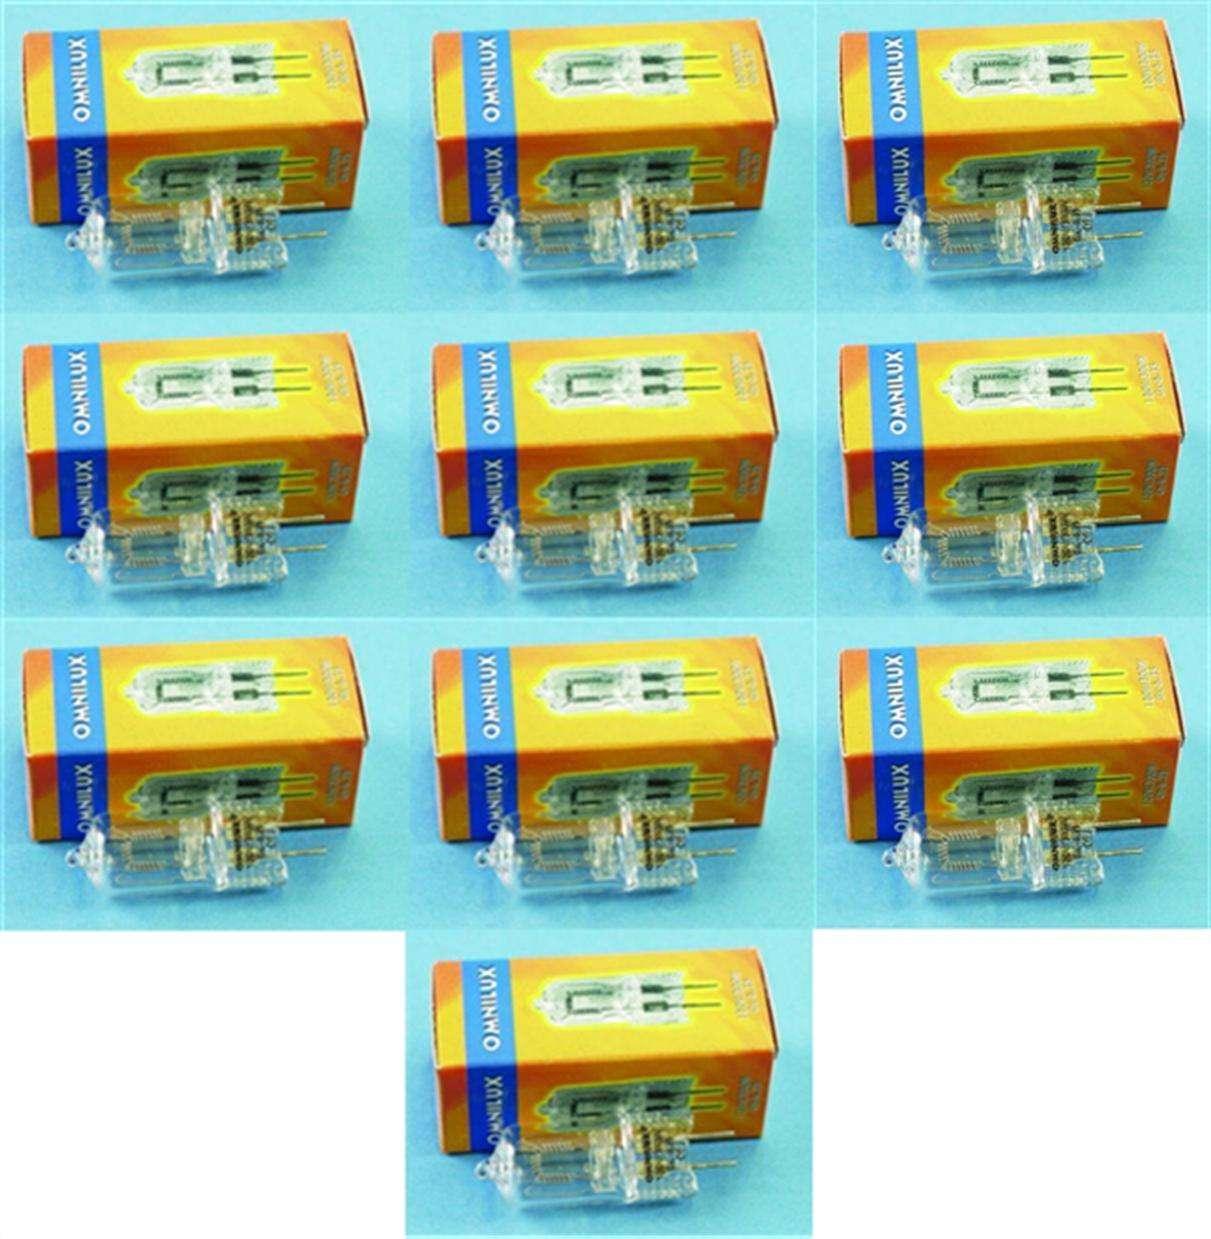 10 Stück 120V 300W Gx-6,35 G-6,35 Studiolampe Stiftsockel-Lampe Halogenlampe NEU